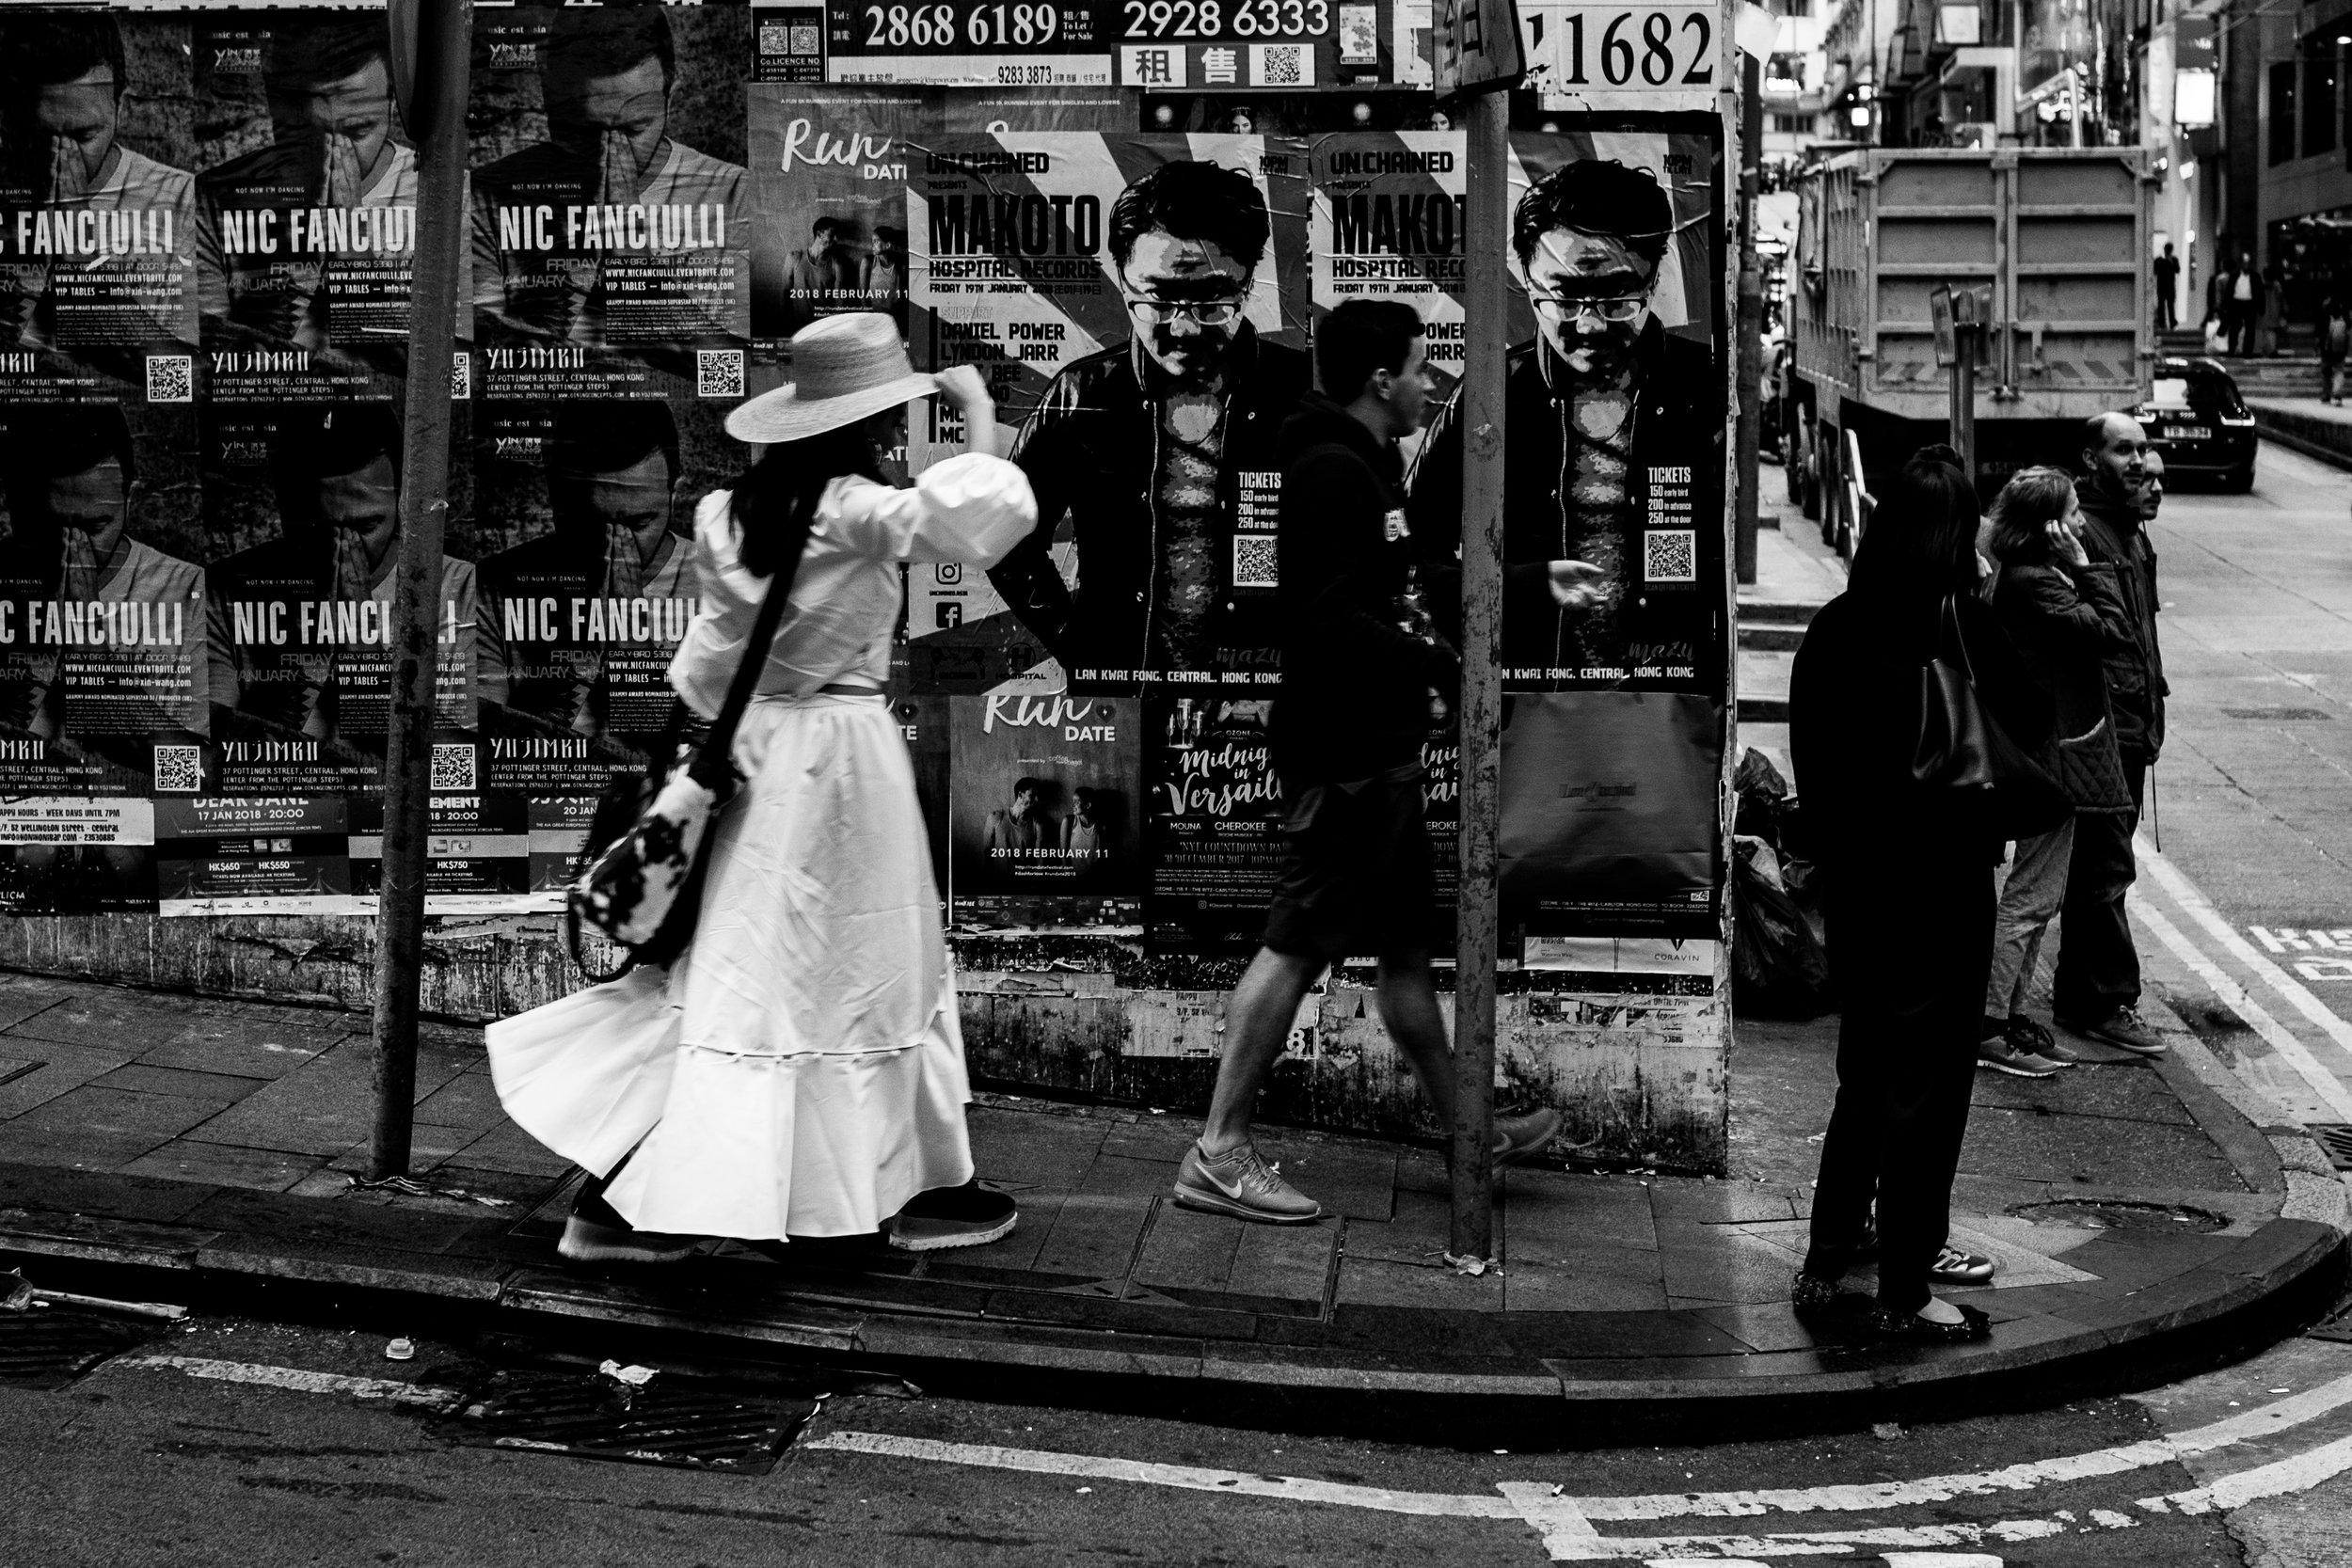 Monochrome posters, Hong Kong -January 2018